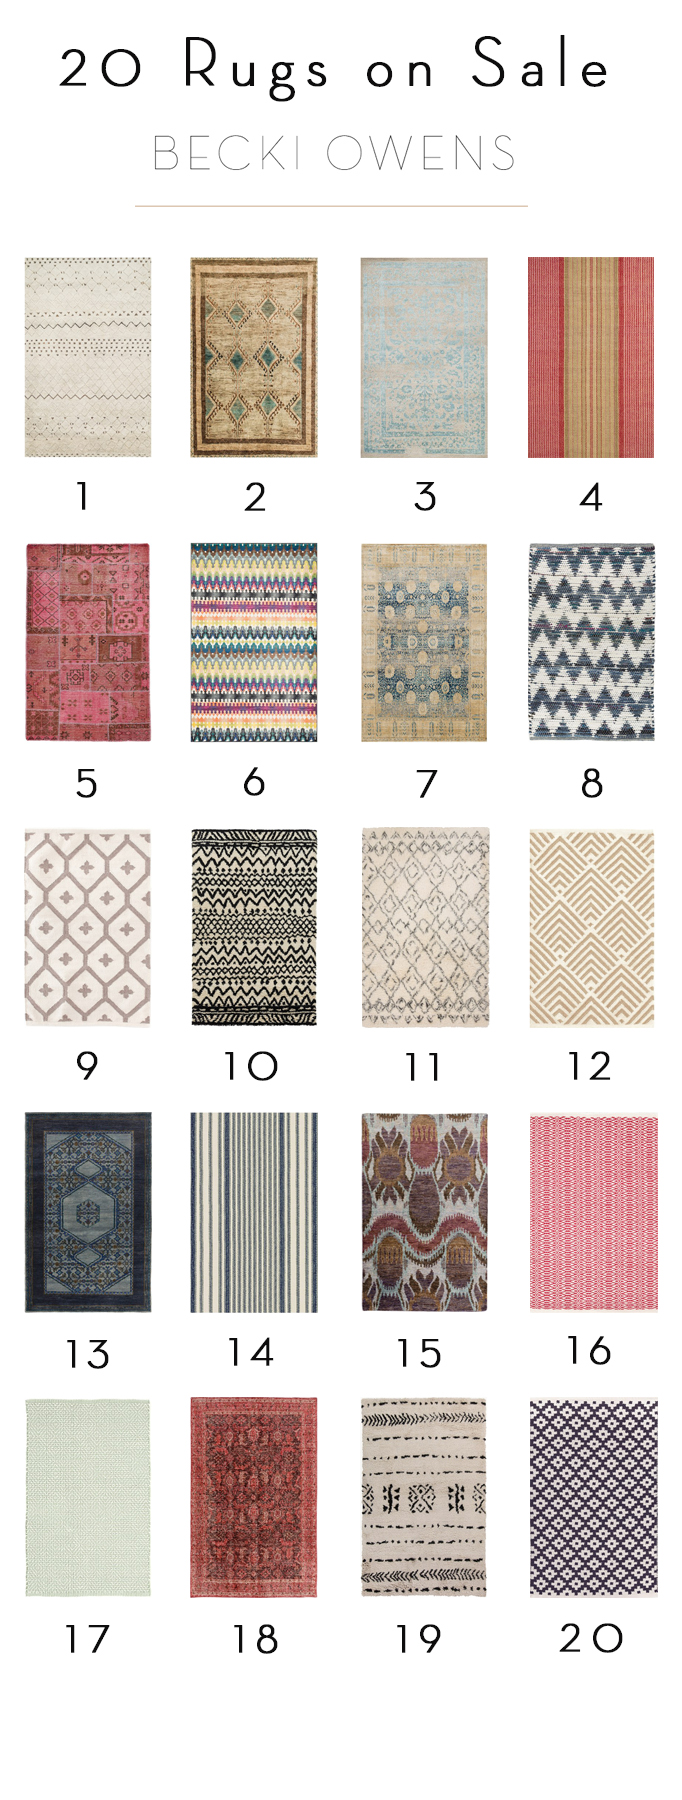 20 Kitchen Rugs on Sale